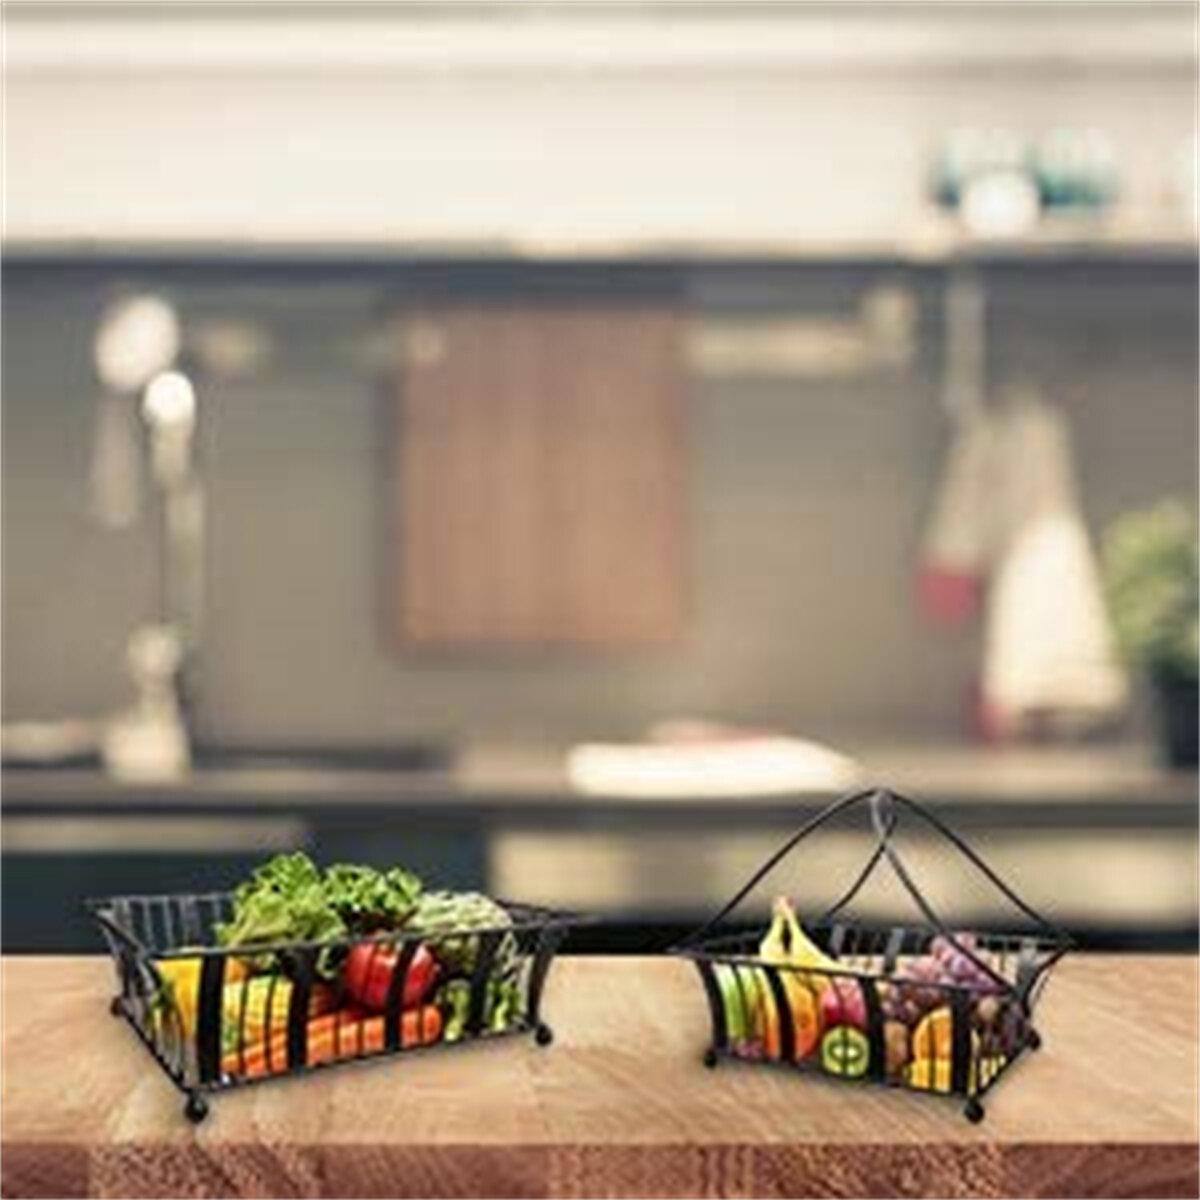 Prep Savour Fruit Basket 2 Tier Fruits And Vegetable Storage Kitchen Counter Display Stand Storage Baskets Metallic Black Bread Fruit Vegetable Organizer Rack Wayfair